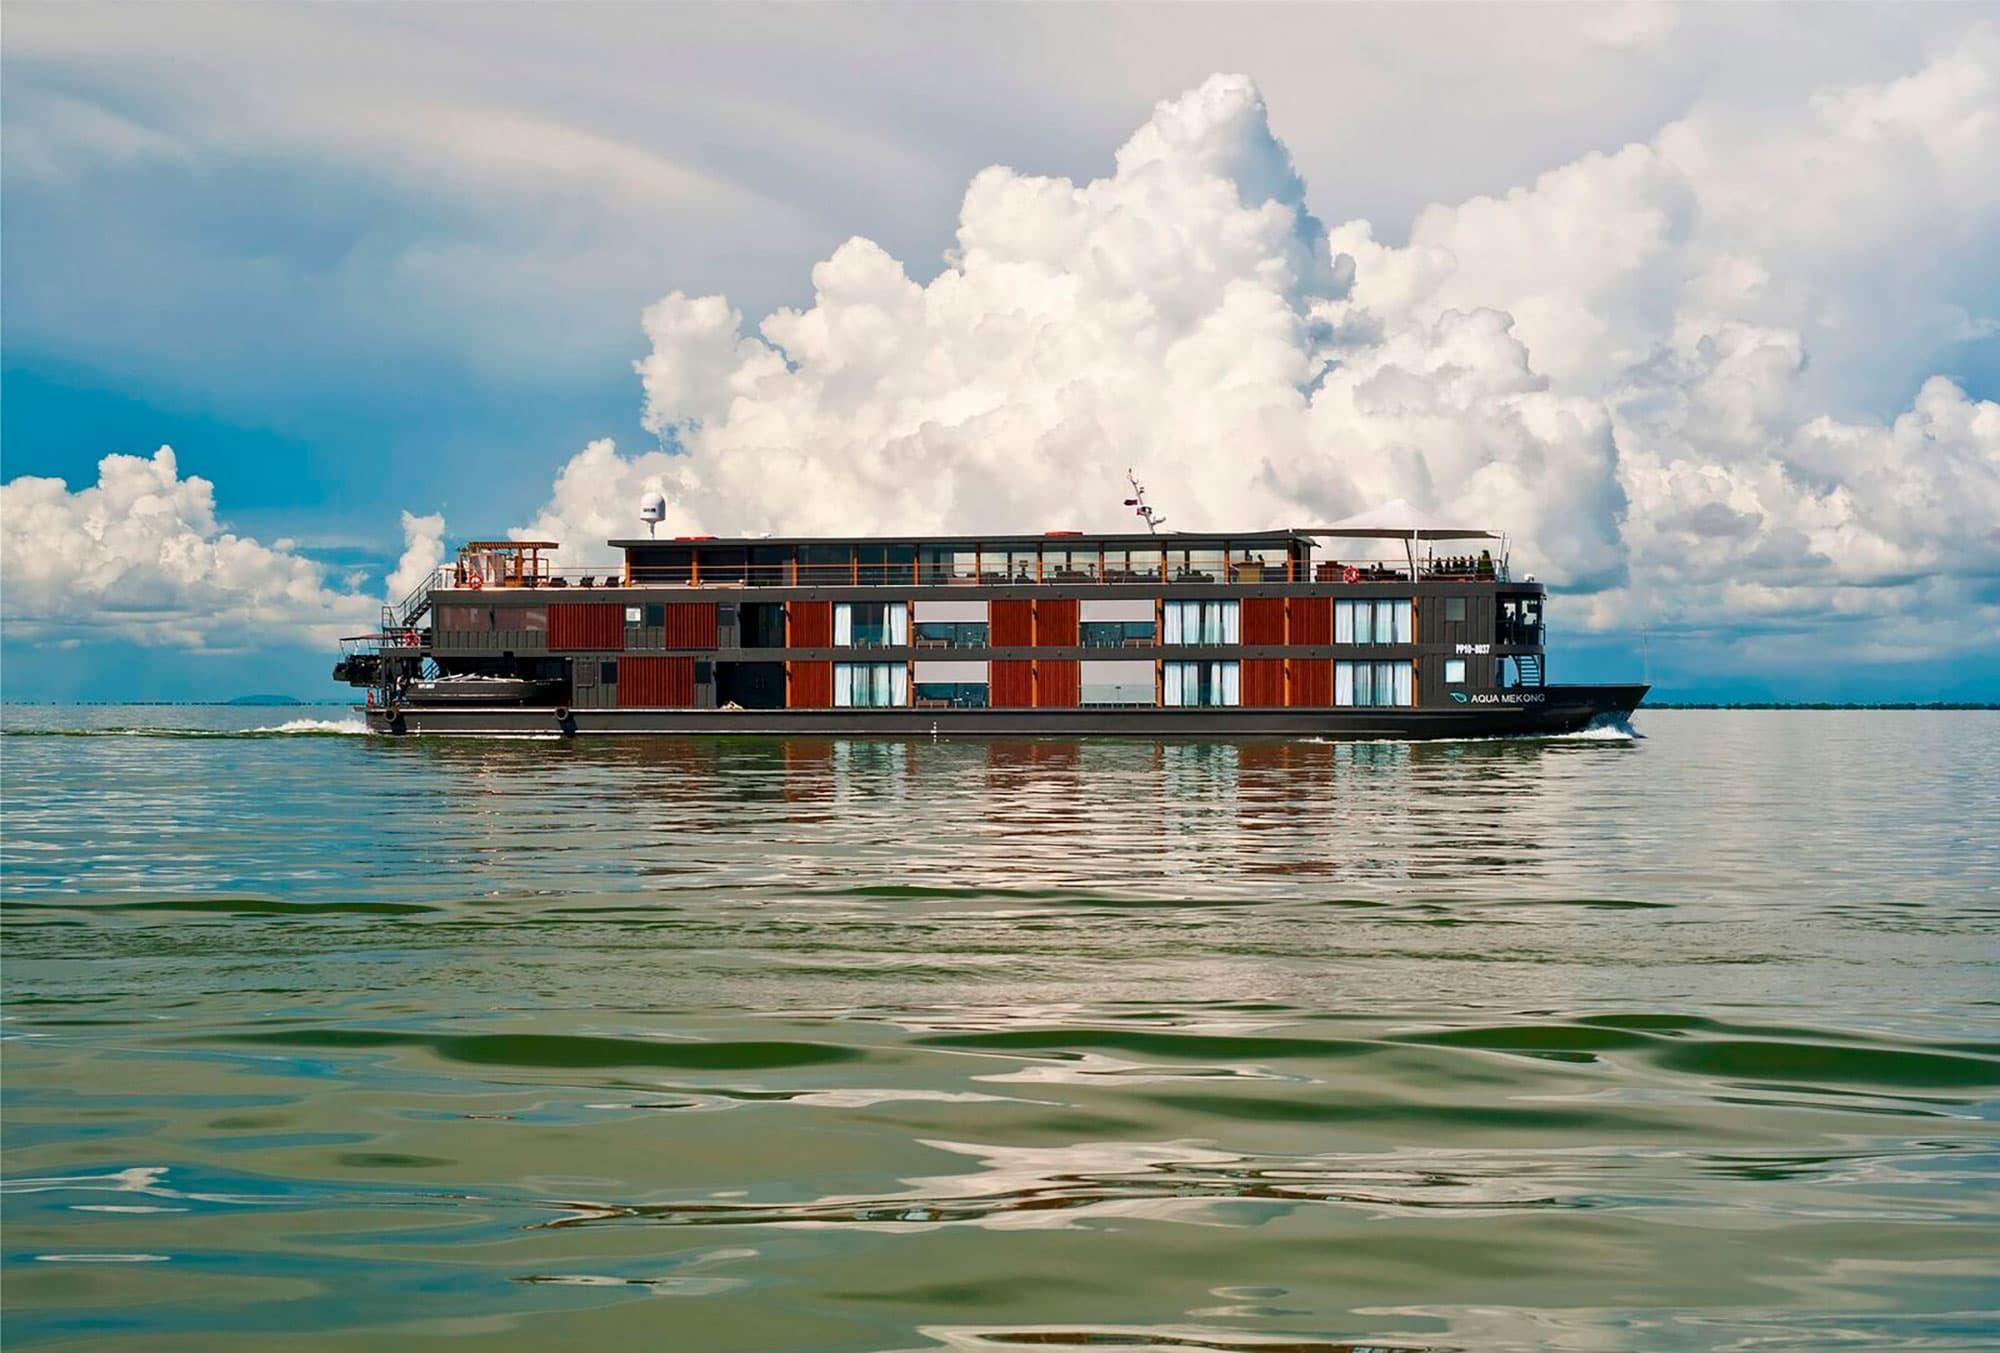 Crucero AQUA de 4 noches – Río arriba – Temporada de Agua Alta (De Ho Chi Minh a Phnom Penh) - Vietnam- imagen #1